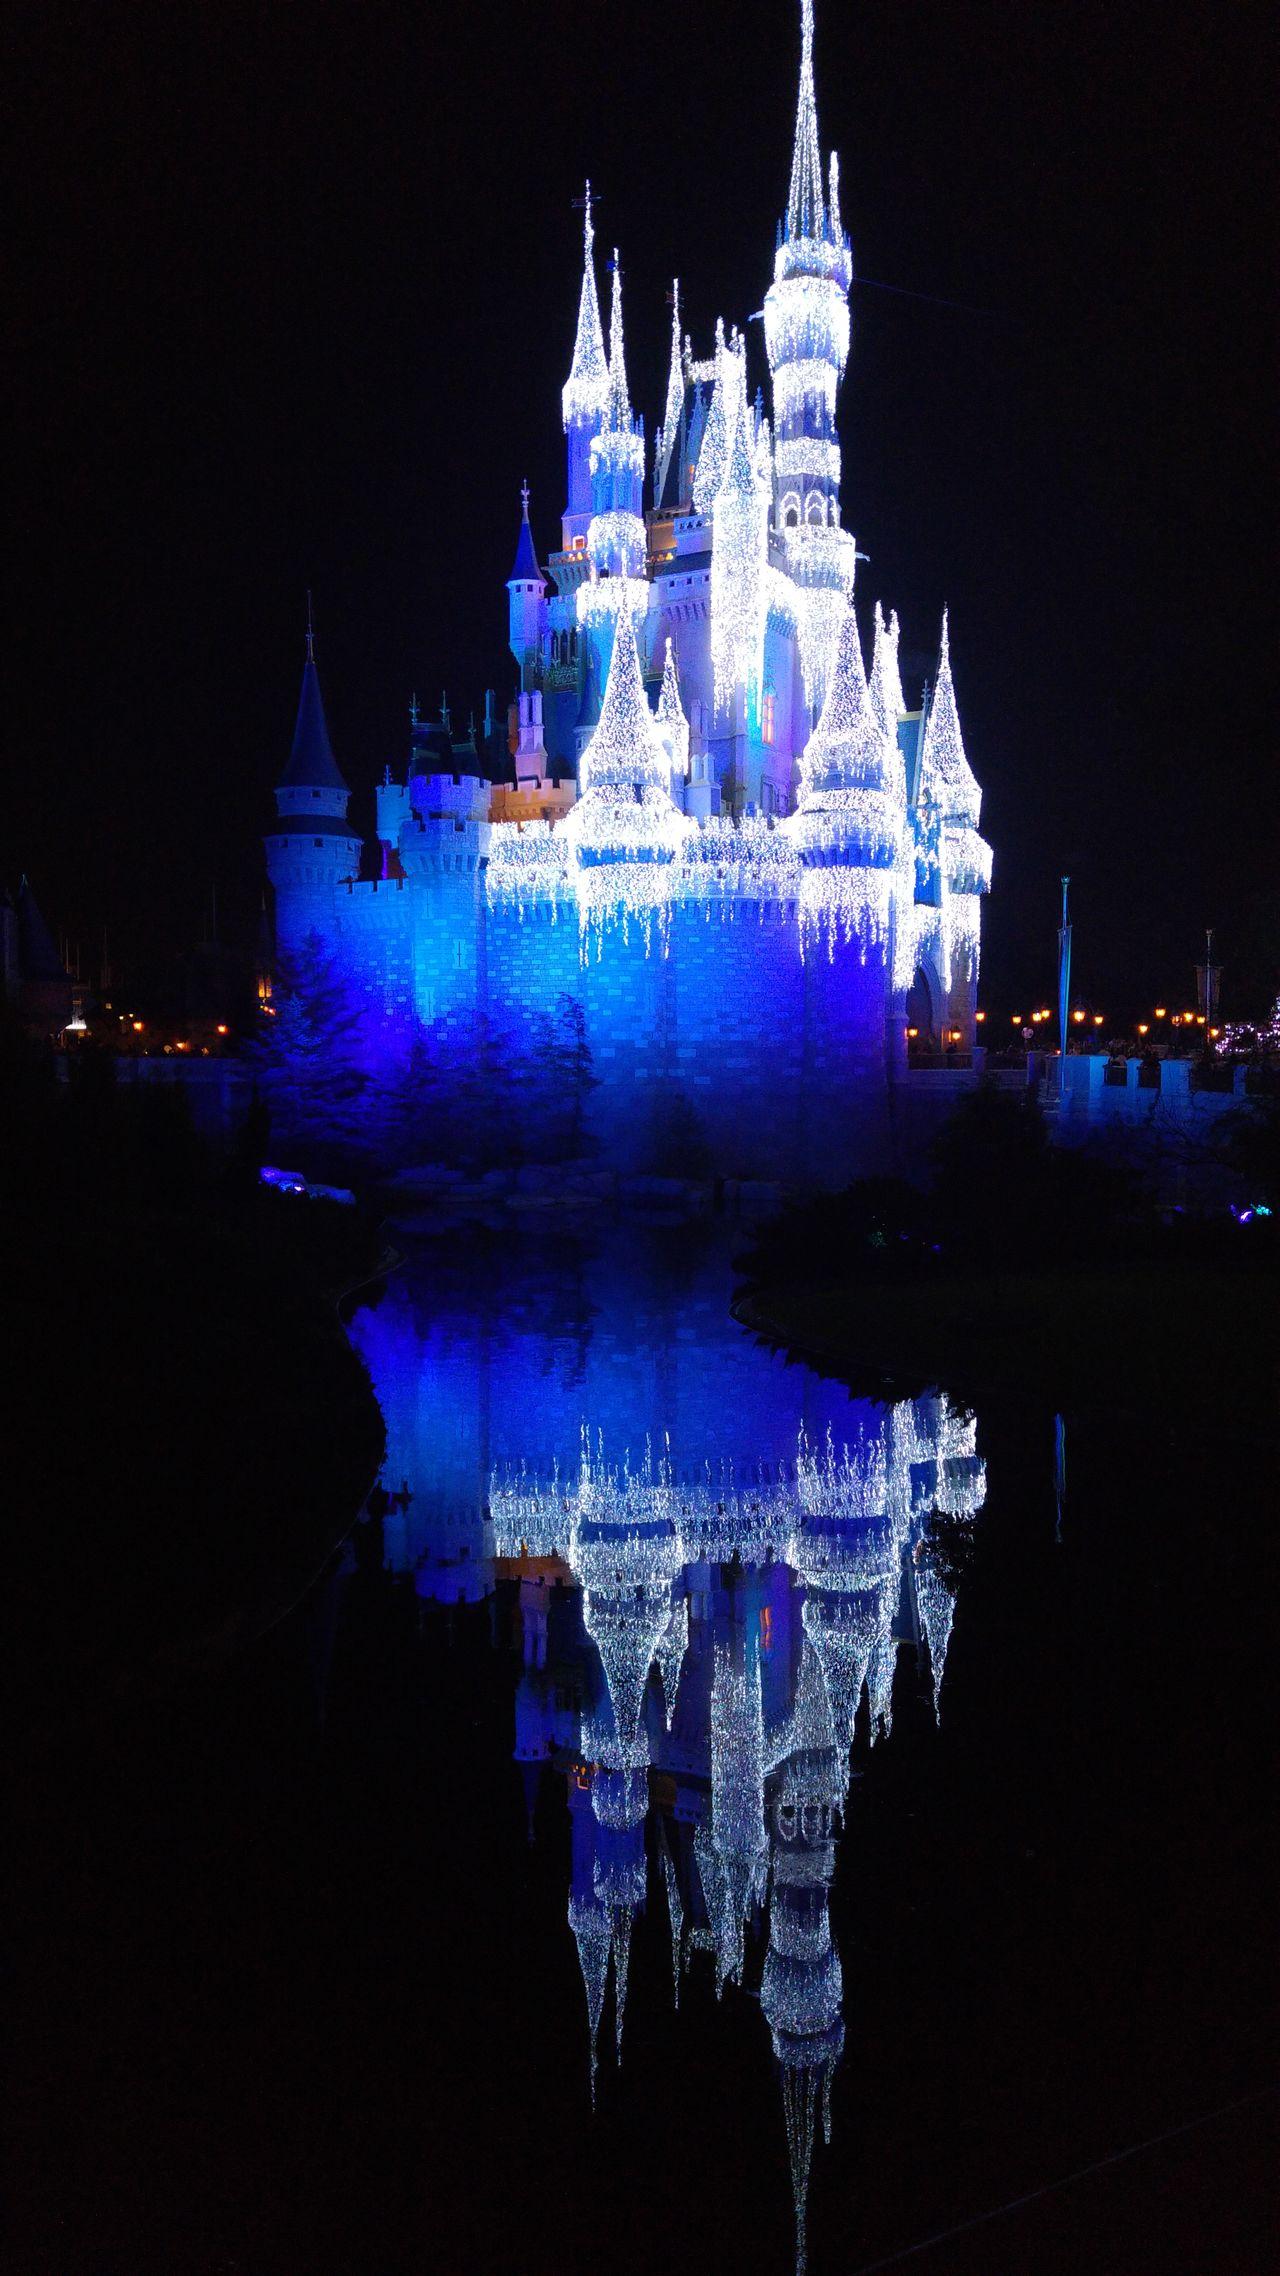 Disney Castle Lights DisneyWorld Cinderella Reflection Water